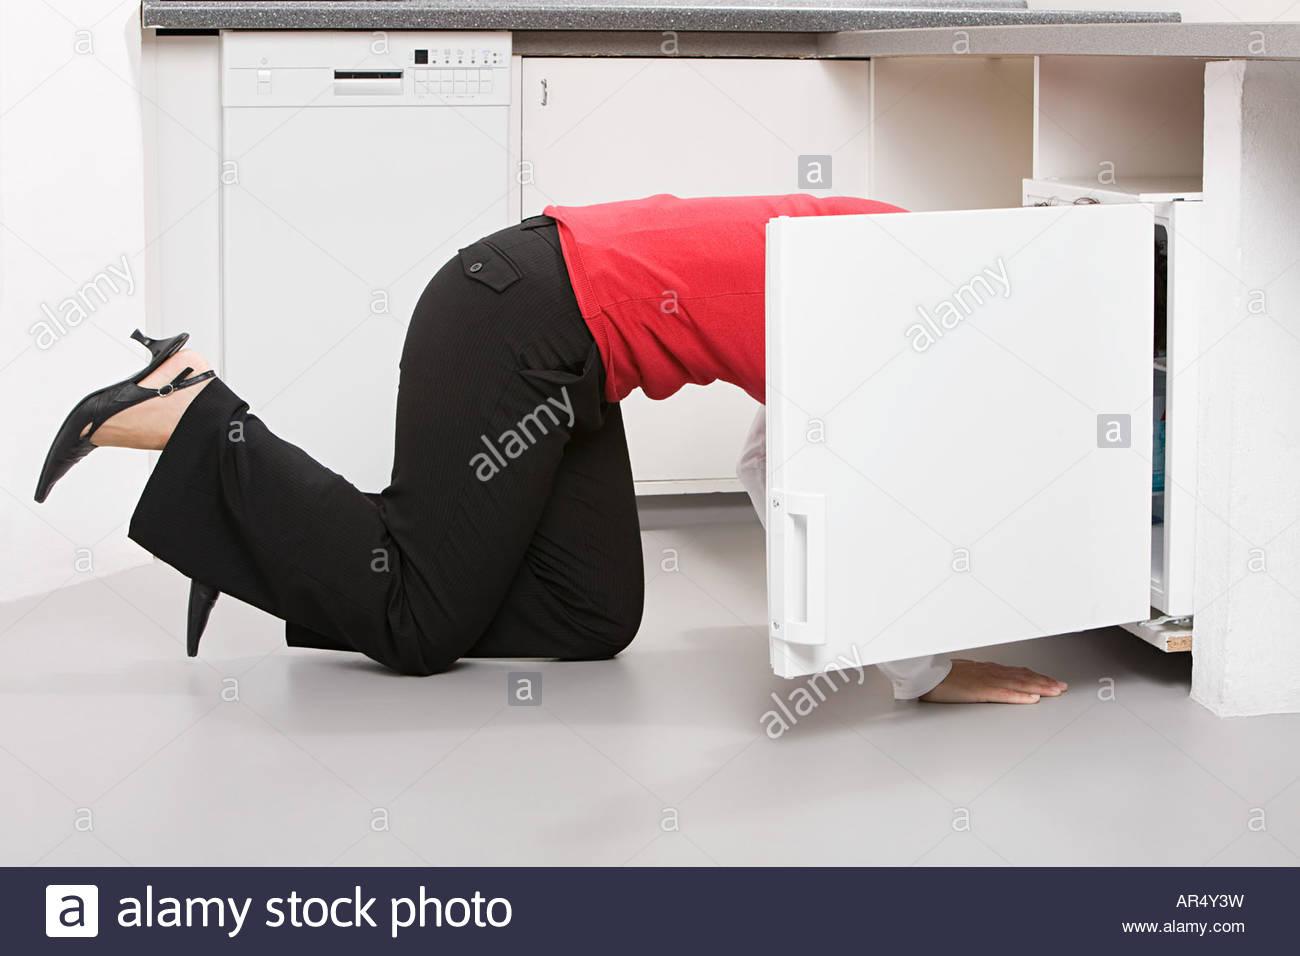 Businesswoman looking in fridge - Stock Image